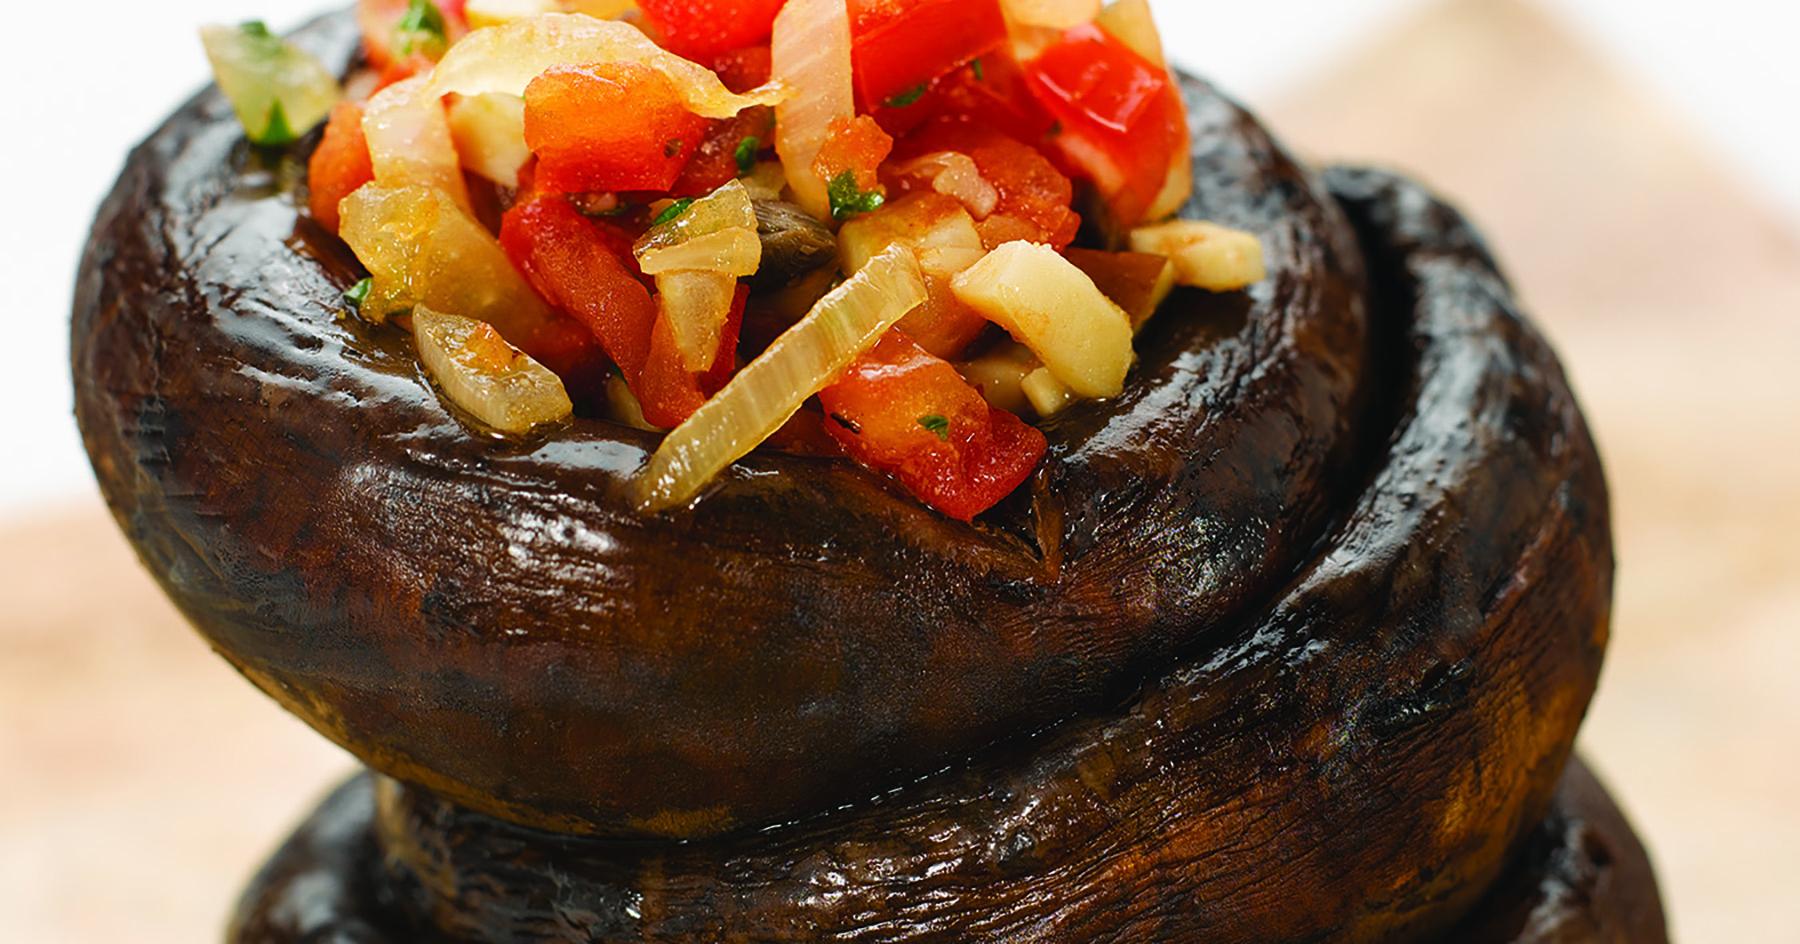 Sauteed Mushroom and Onion Salsa in Caps